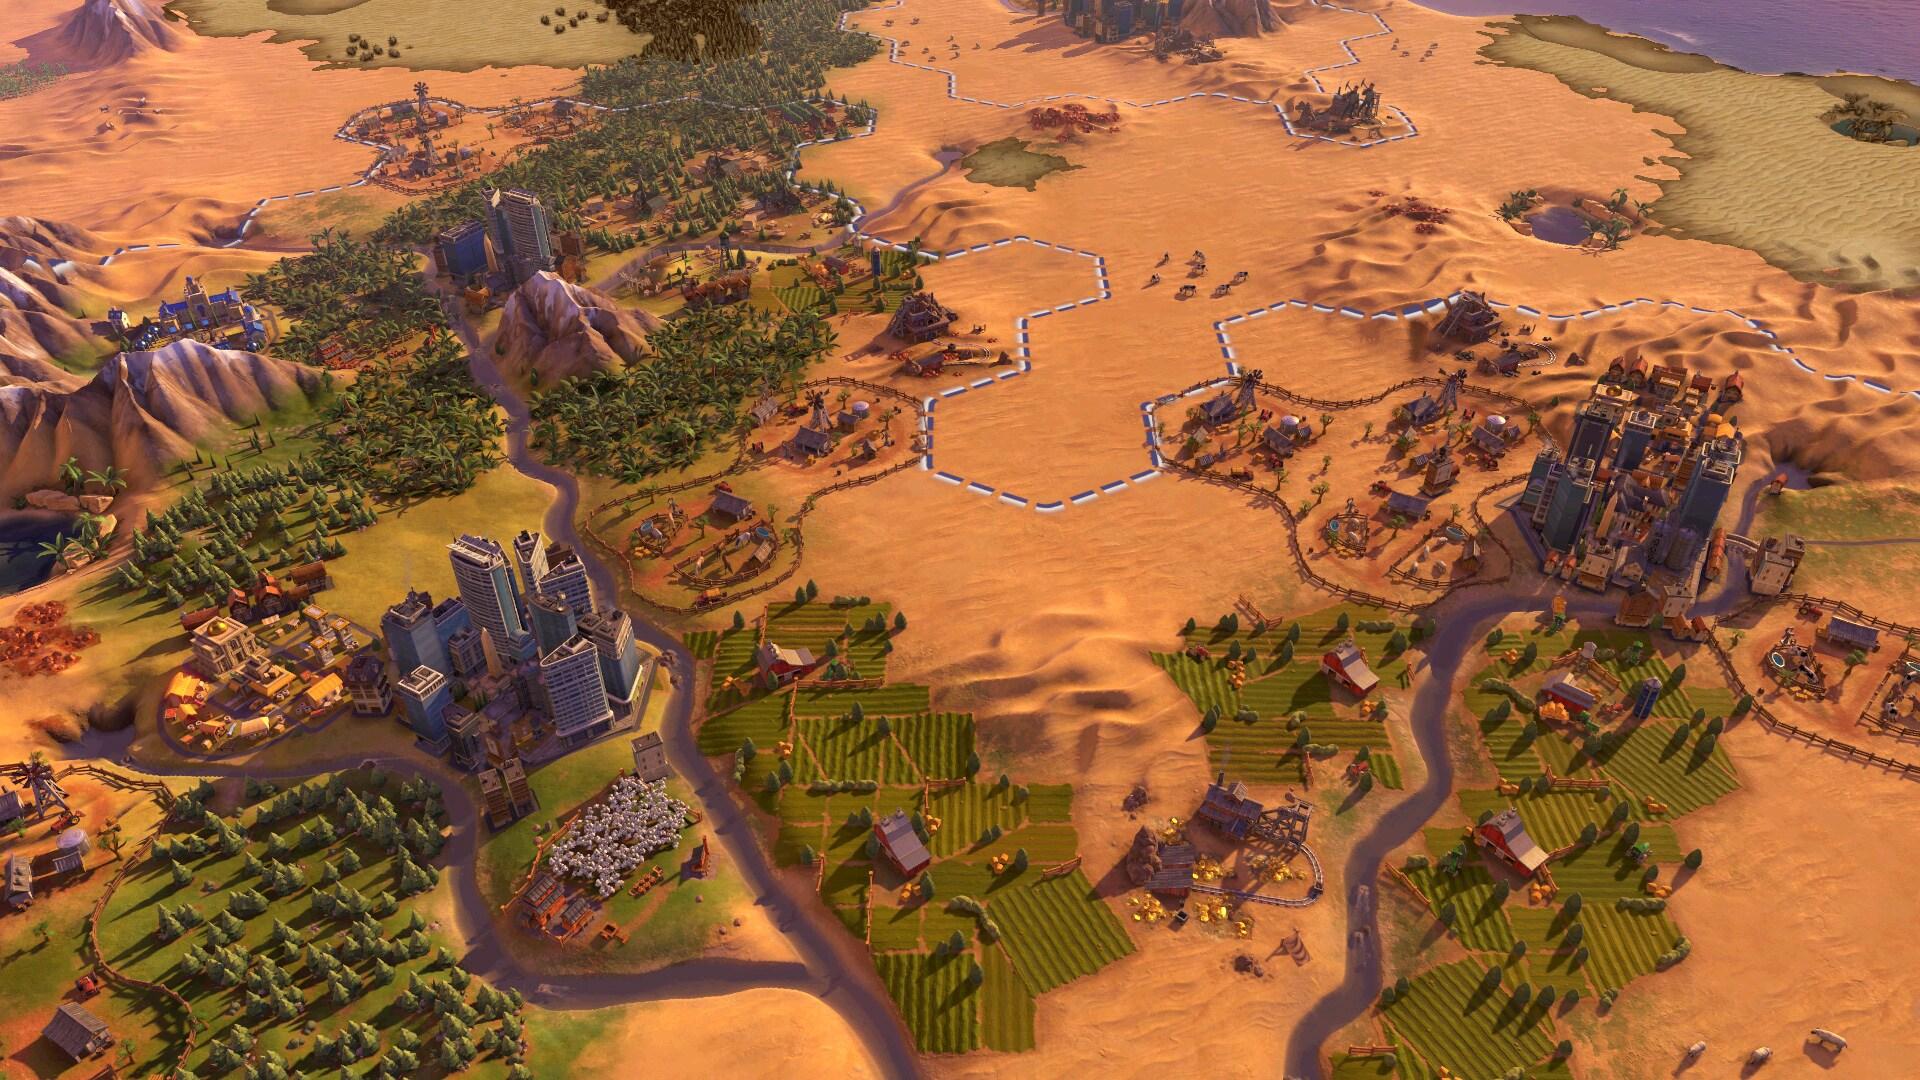 Sid Meier's Civilization VI - Australia Civilization & Scenario Pack (PC) - Steam Key - GLOBAL - 3